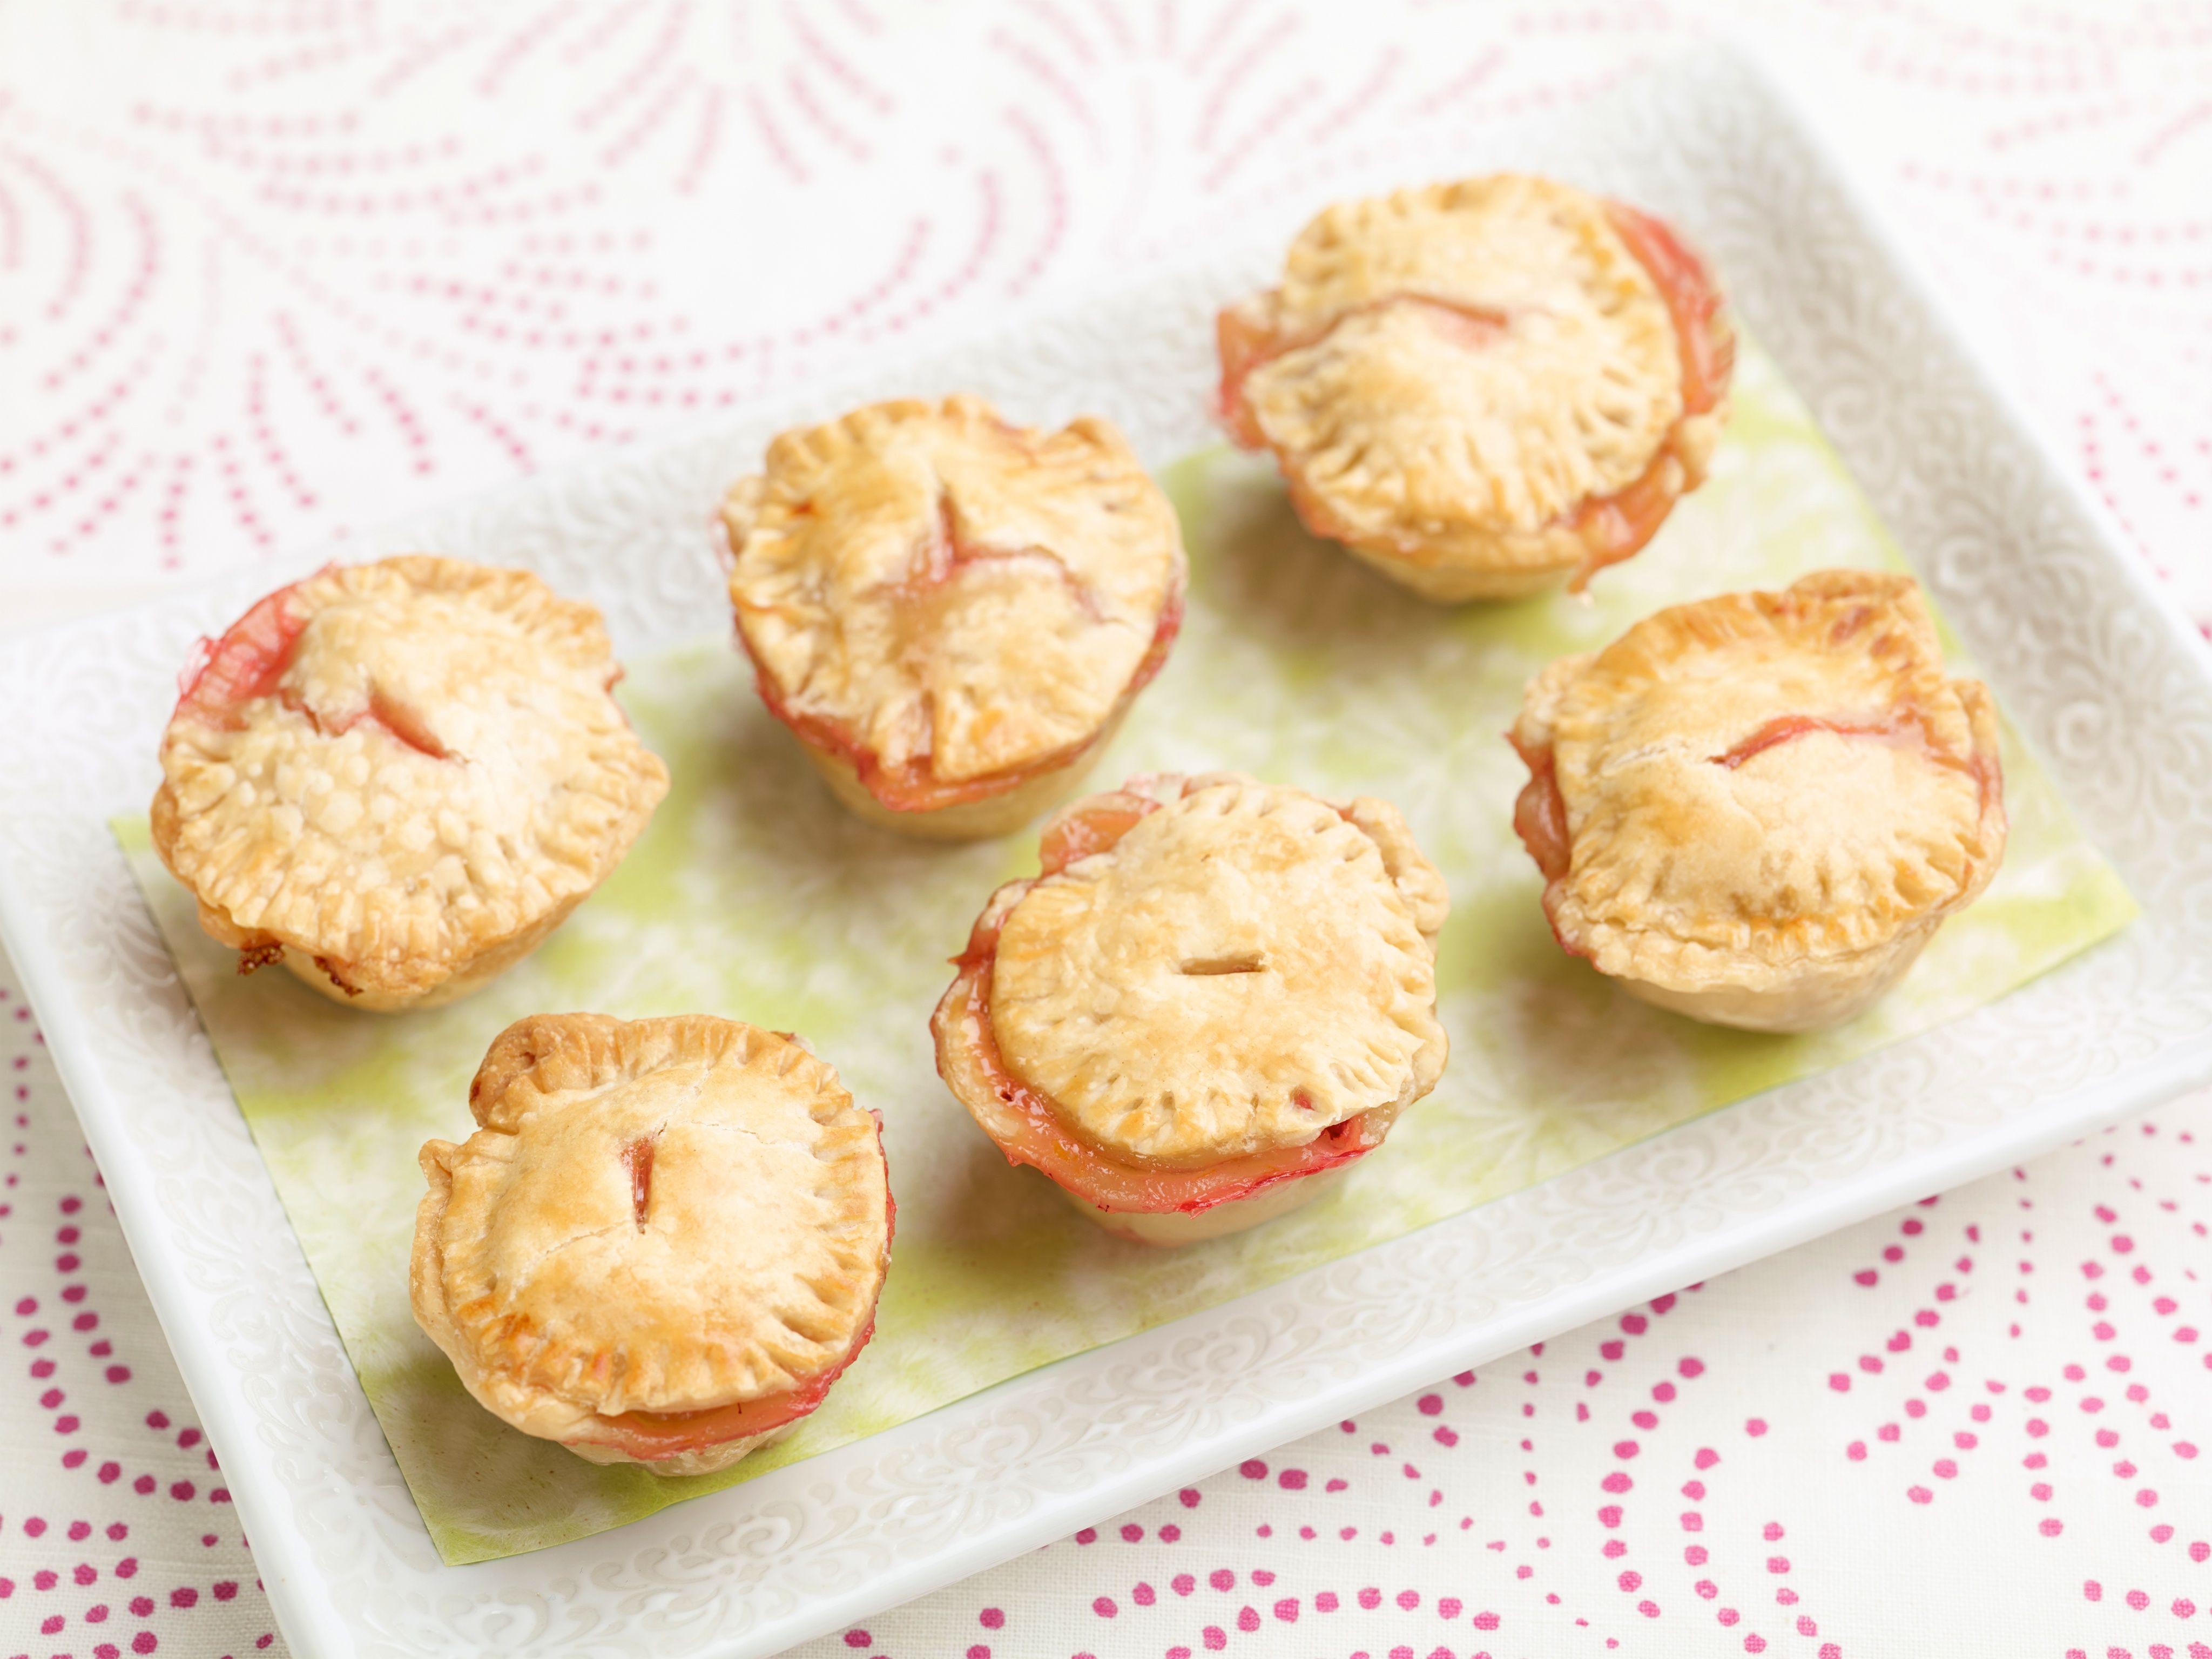 Baby strawberry and honey pies recipe giada de laurentiis pie baby strawberry and honey pies recipe giada de laurentiis pie recipes and pies forumfinder Gallery